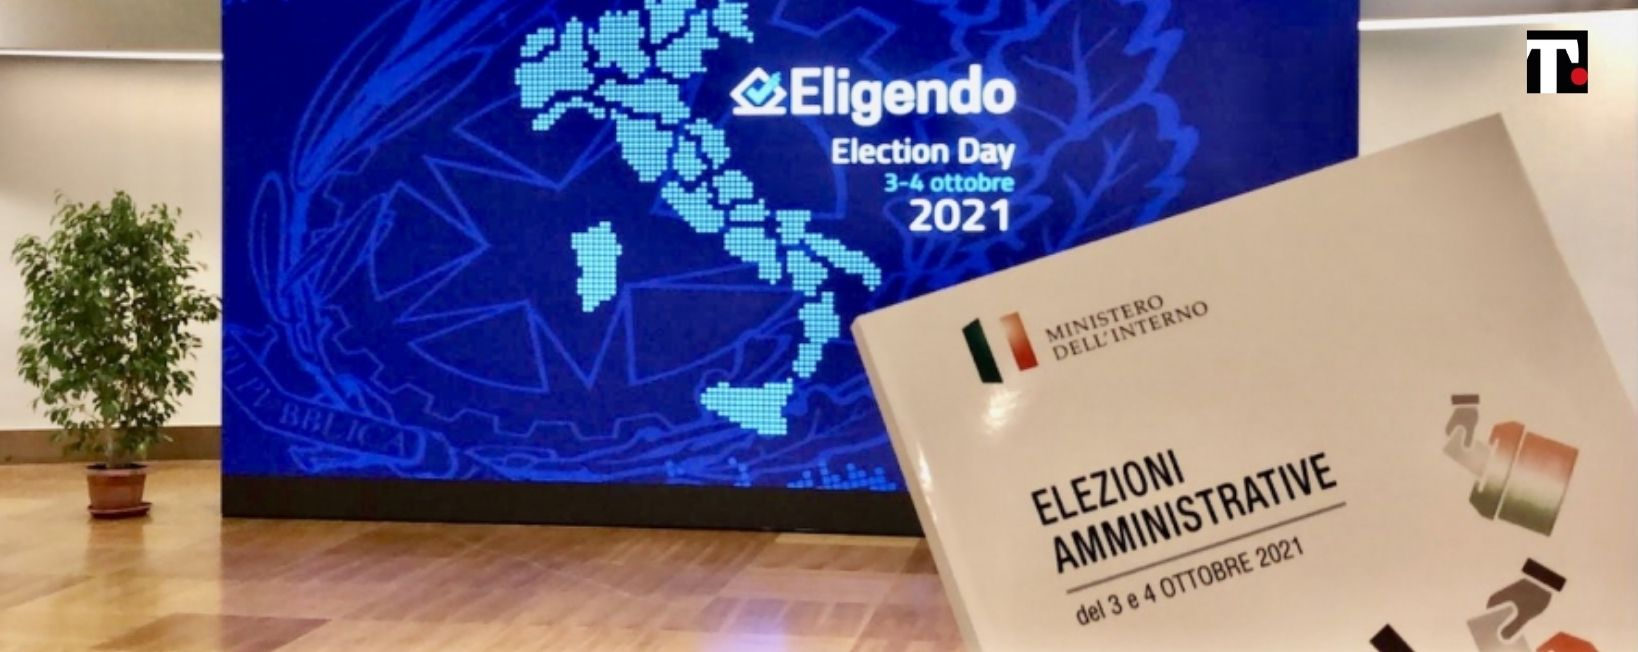 ballottaggio roma